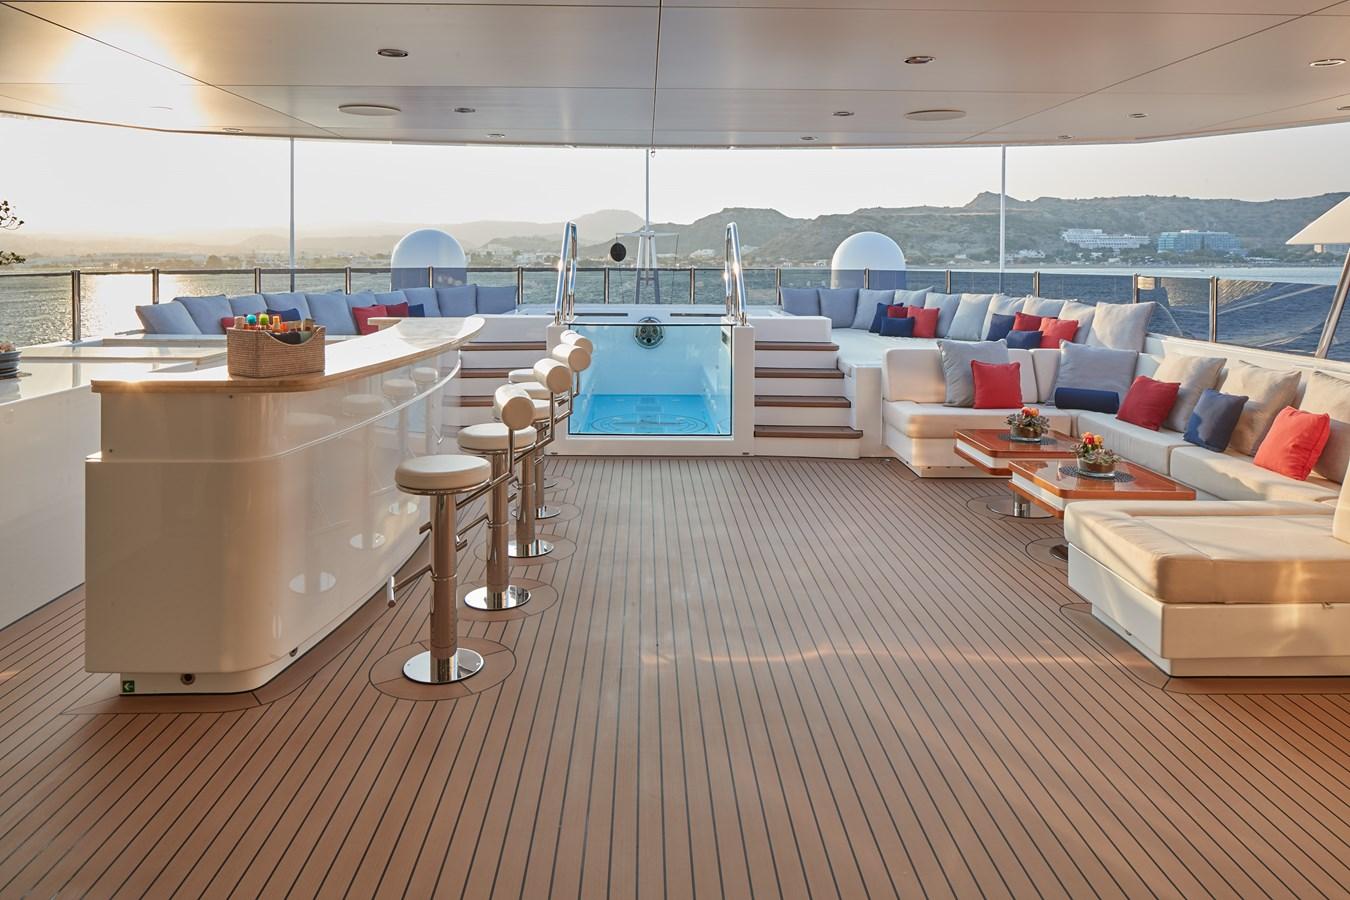 Jacuzzi deck bar 2015 SUNRISE  Mega Yacht 2968905